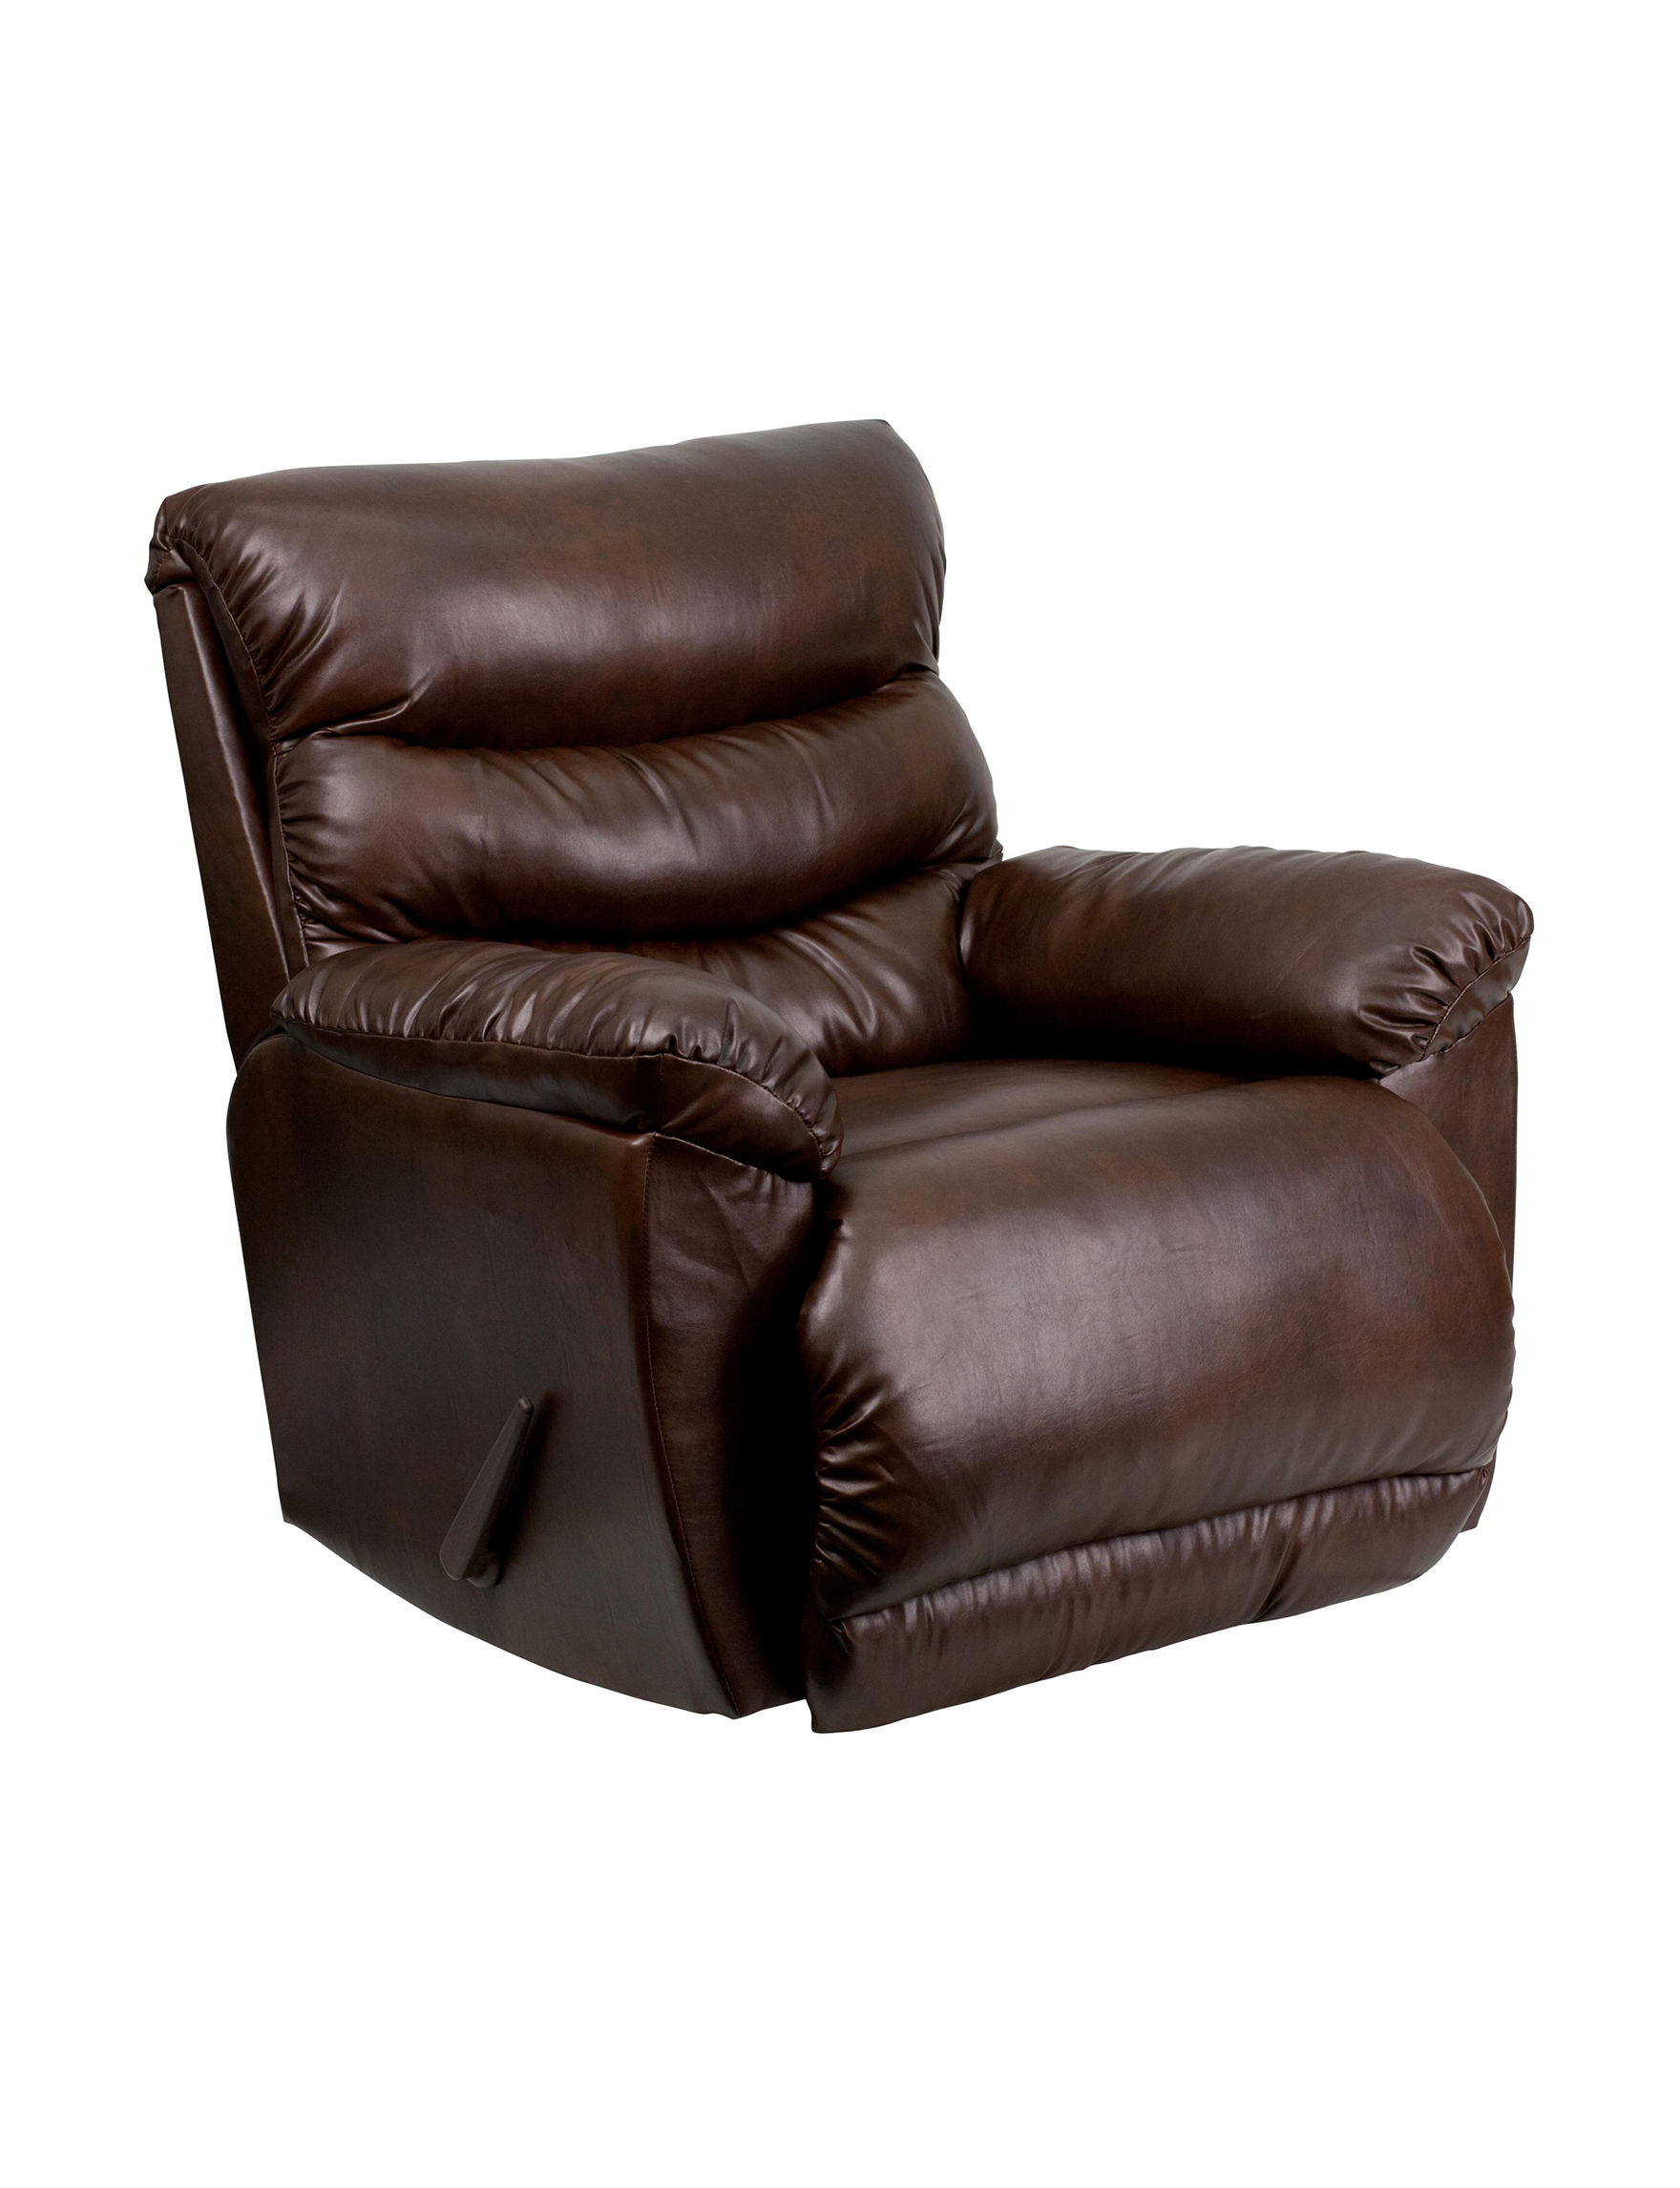 Flash Furniture Espresso Accent Chairs Living Room Furniture